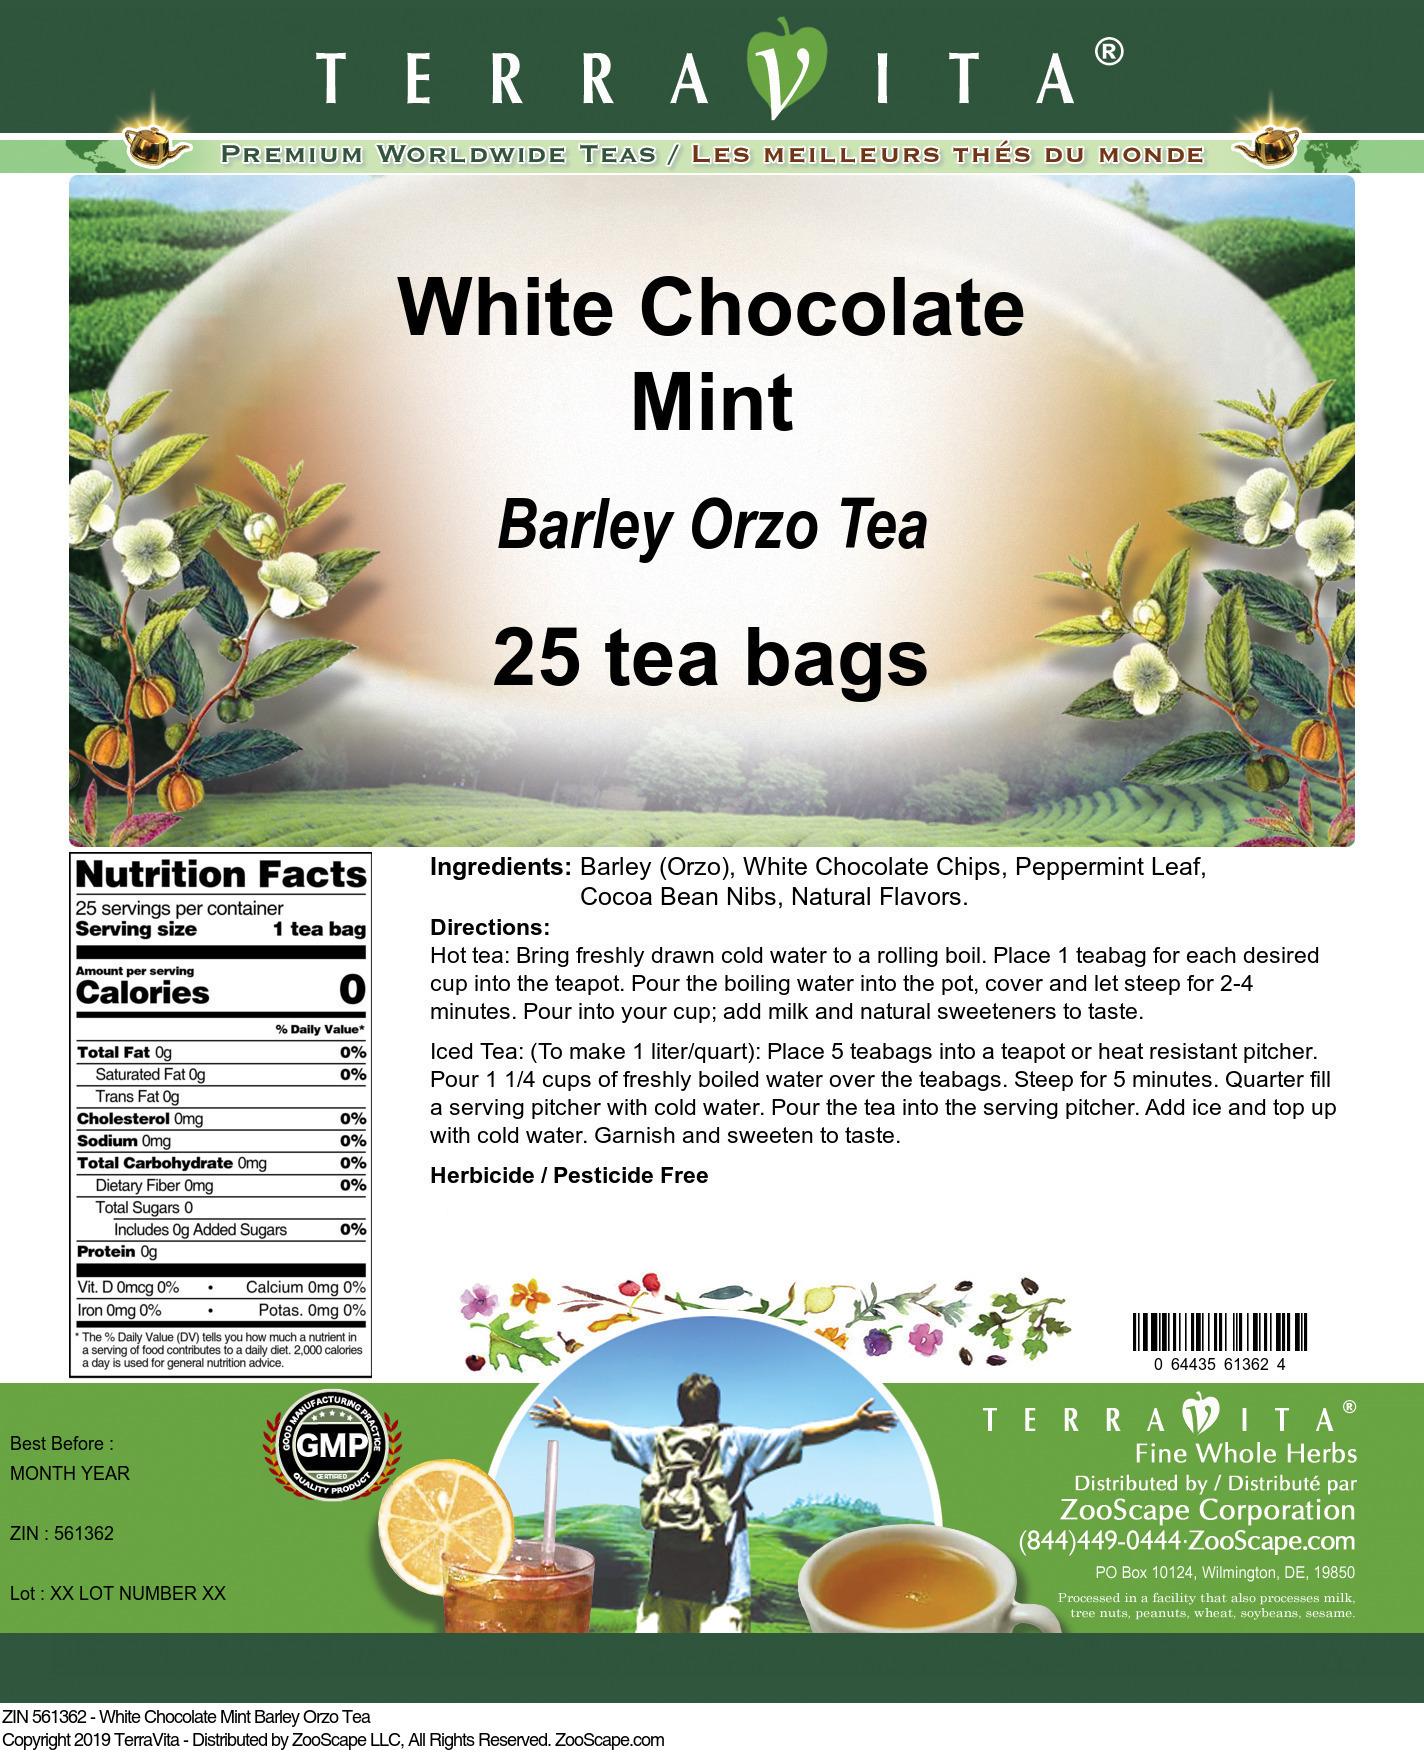 White Chocolate Mint Barley Orzo Tea